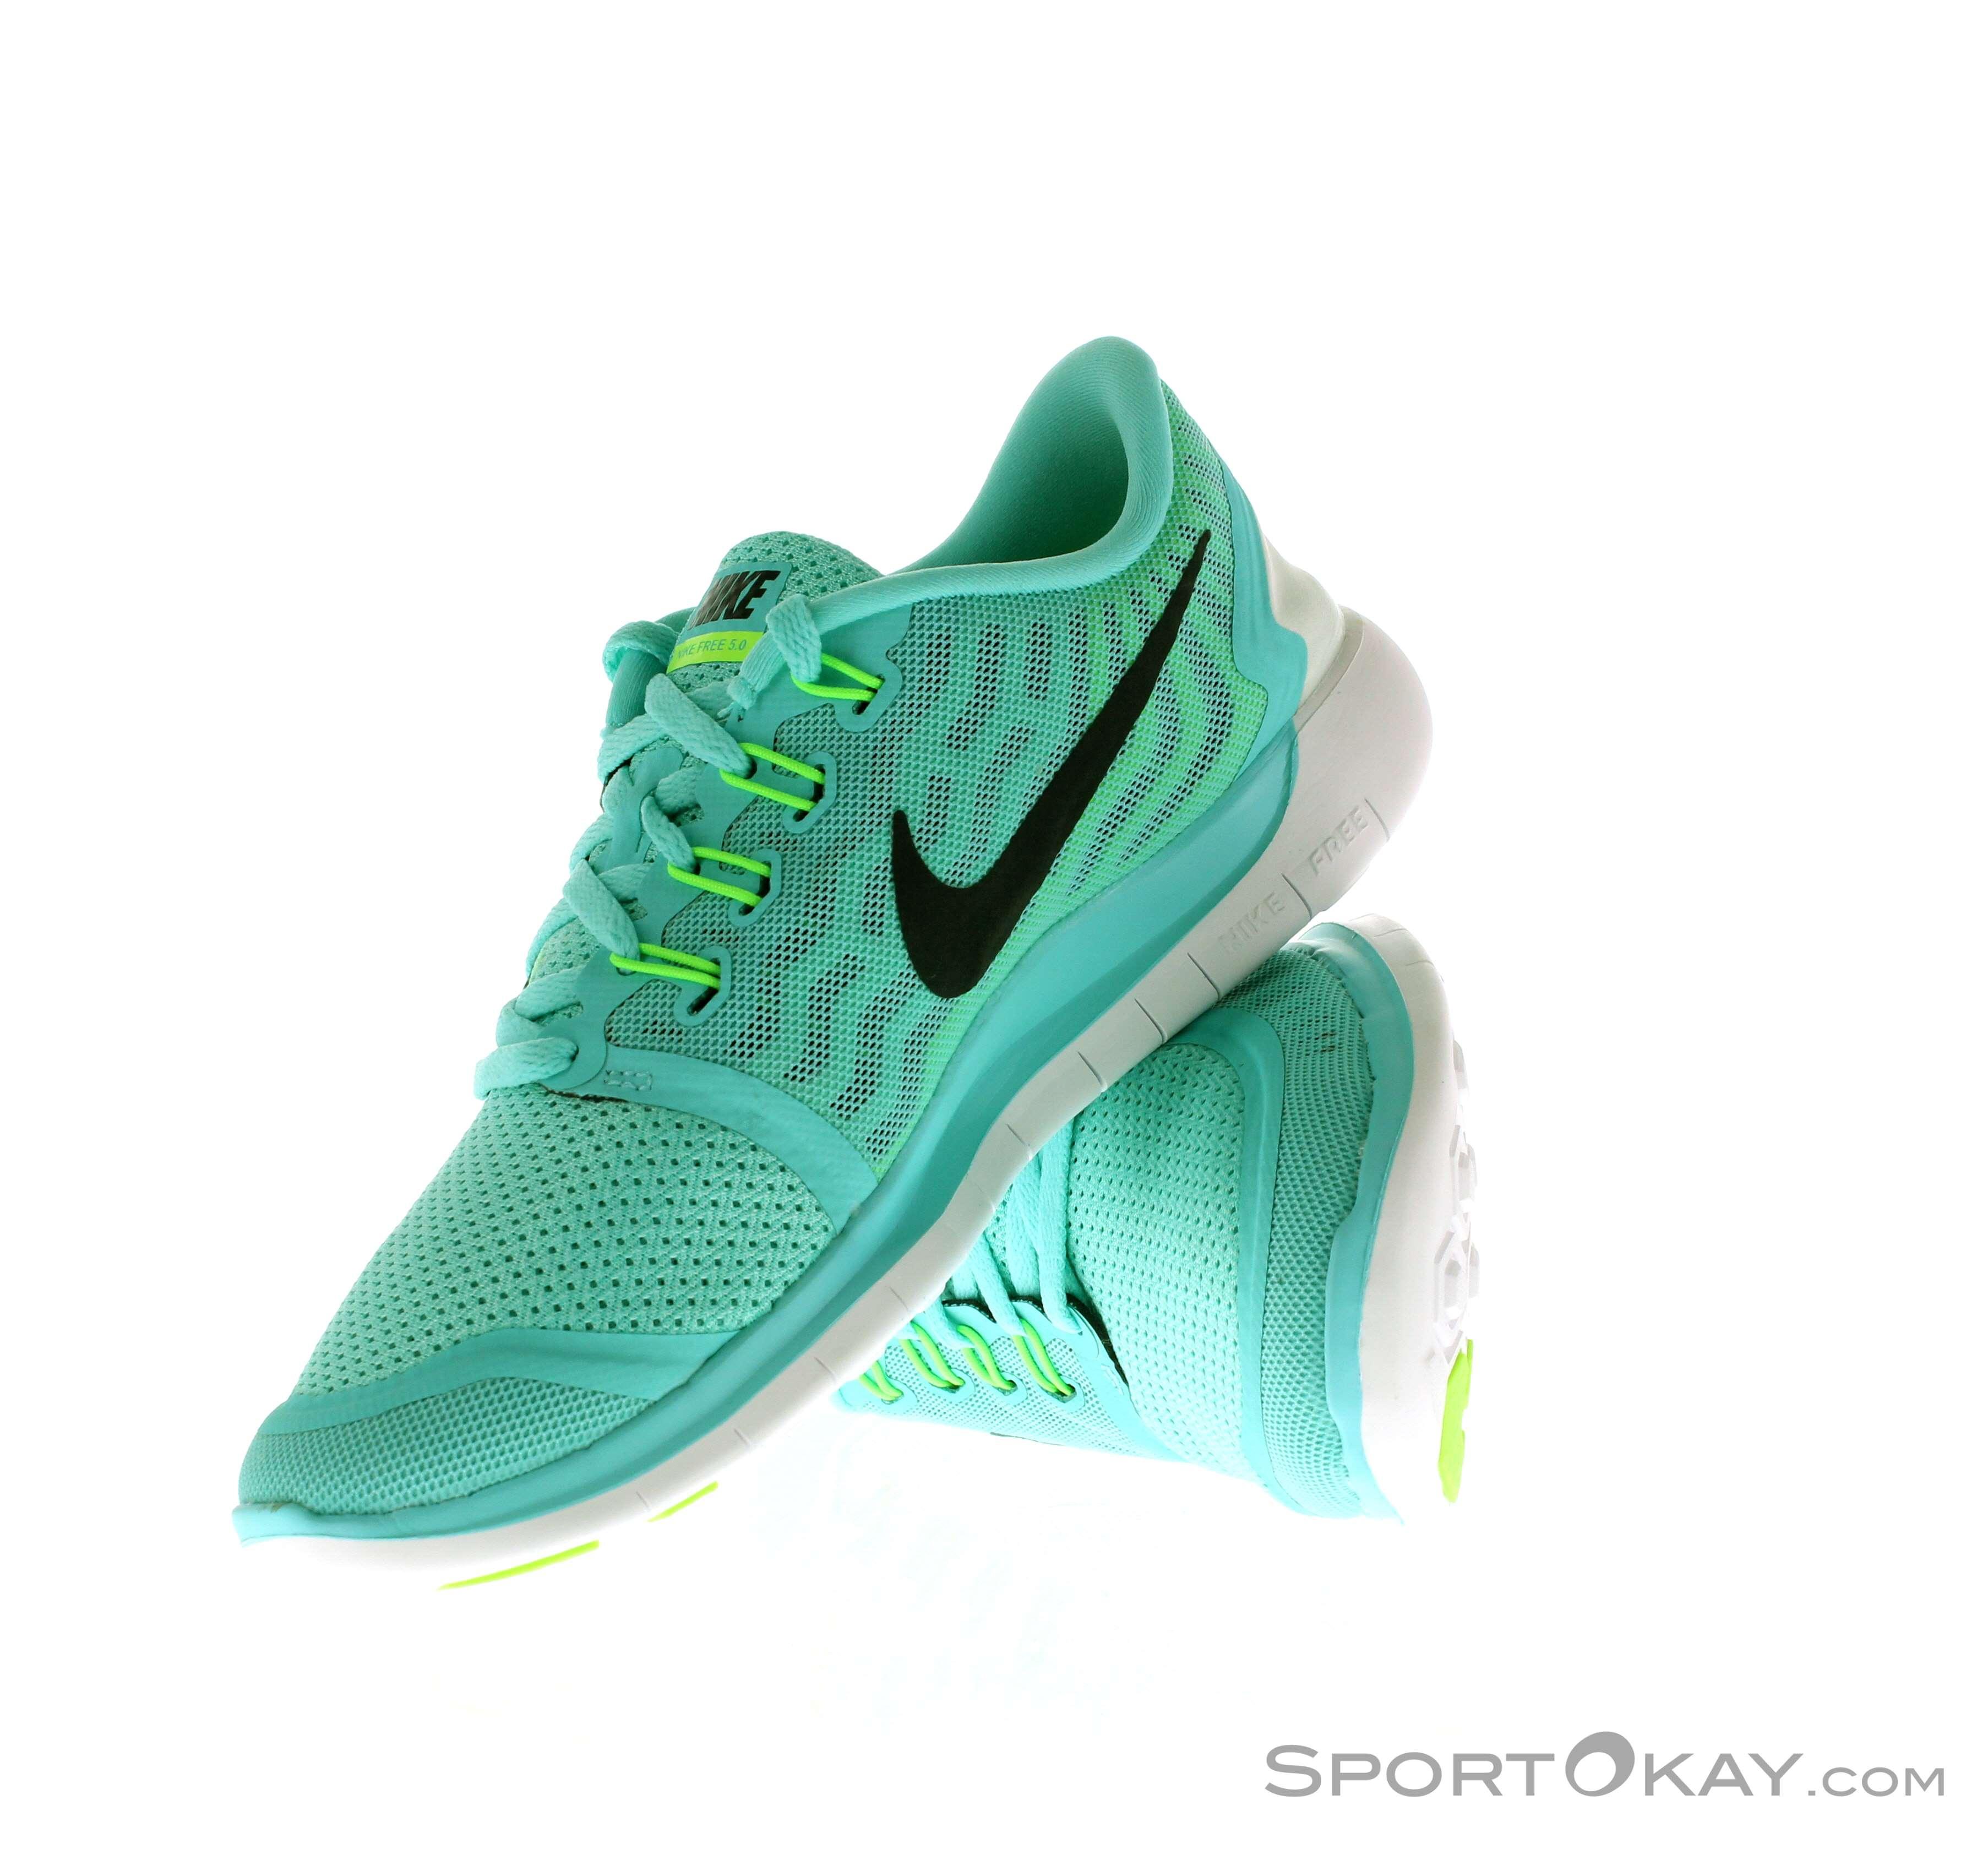 big sale 98c50 07367 Nike Free 5.0 Damen Laufschuhe, Nike, Blau, , Damen, 0026-10230